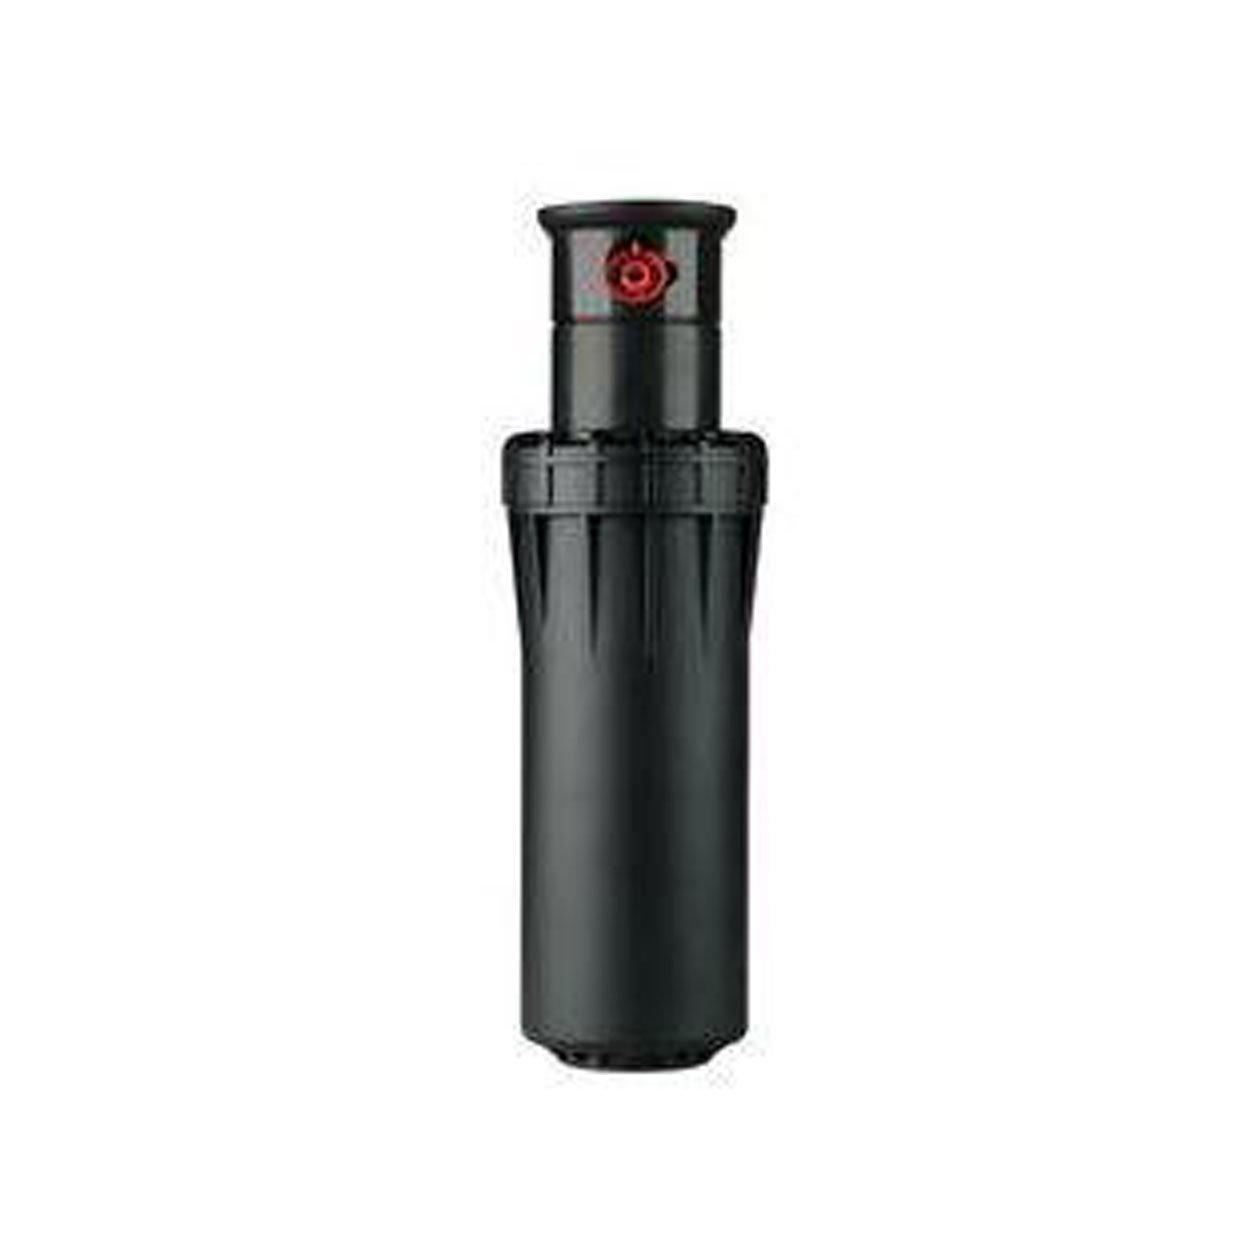 Hunter Sprinkler I90ARV I-90 Adjustable Arc Pop-Up Full Circle Spary Reclaimed Water ID Sprinkler, 3-Inch